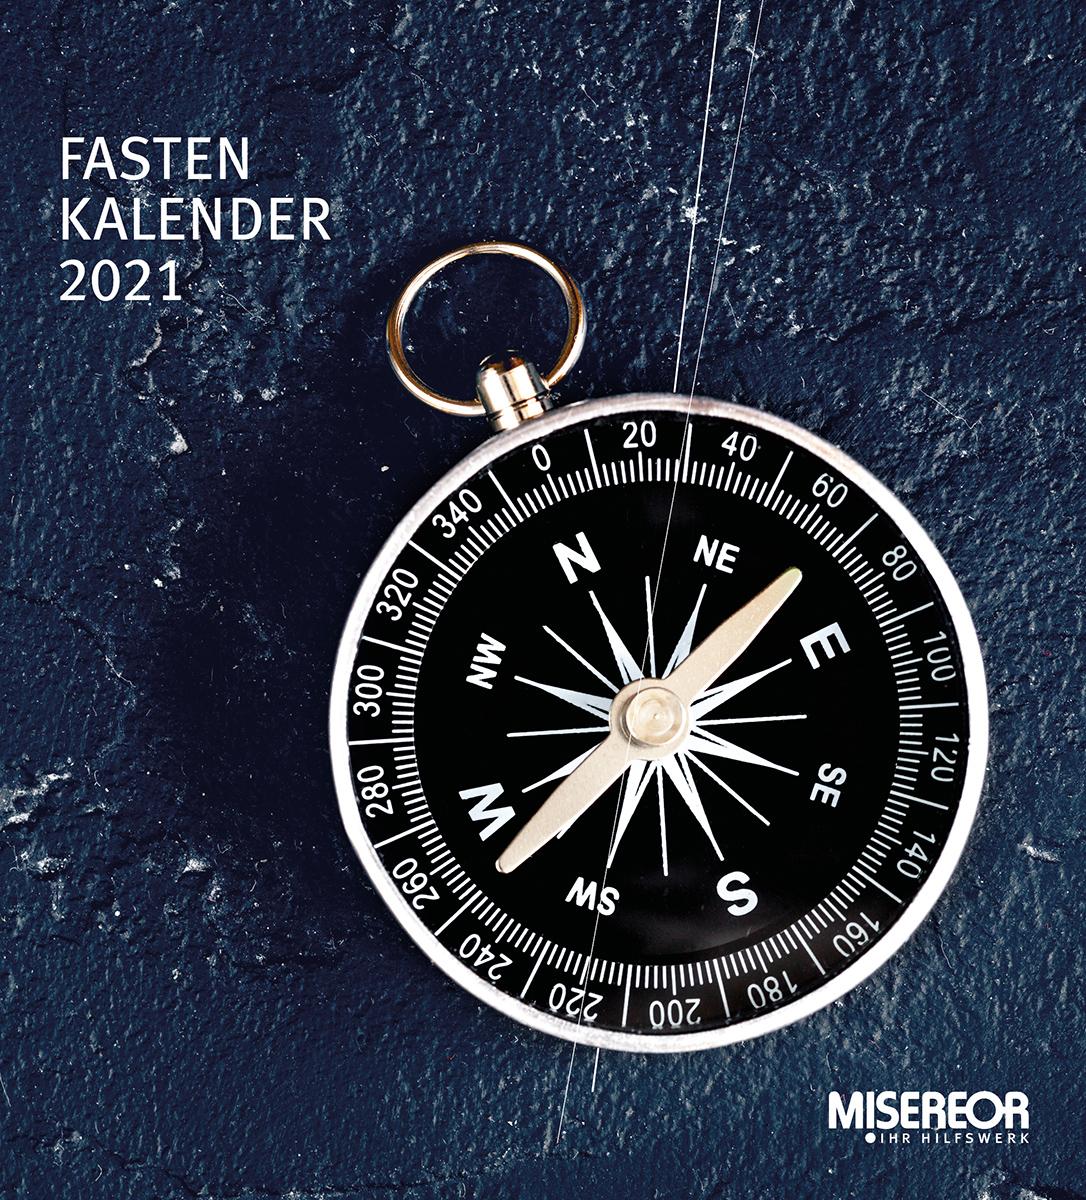 110621_Fastenkalender_2021_0160055e3a4366e